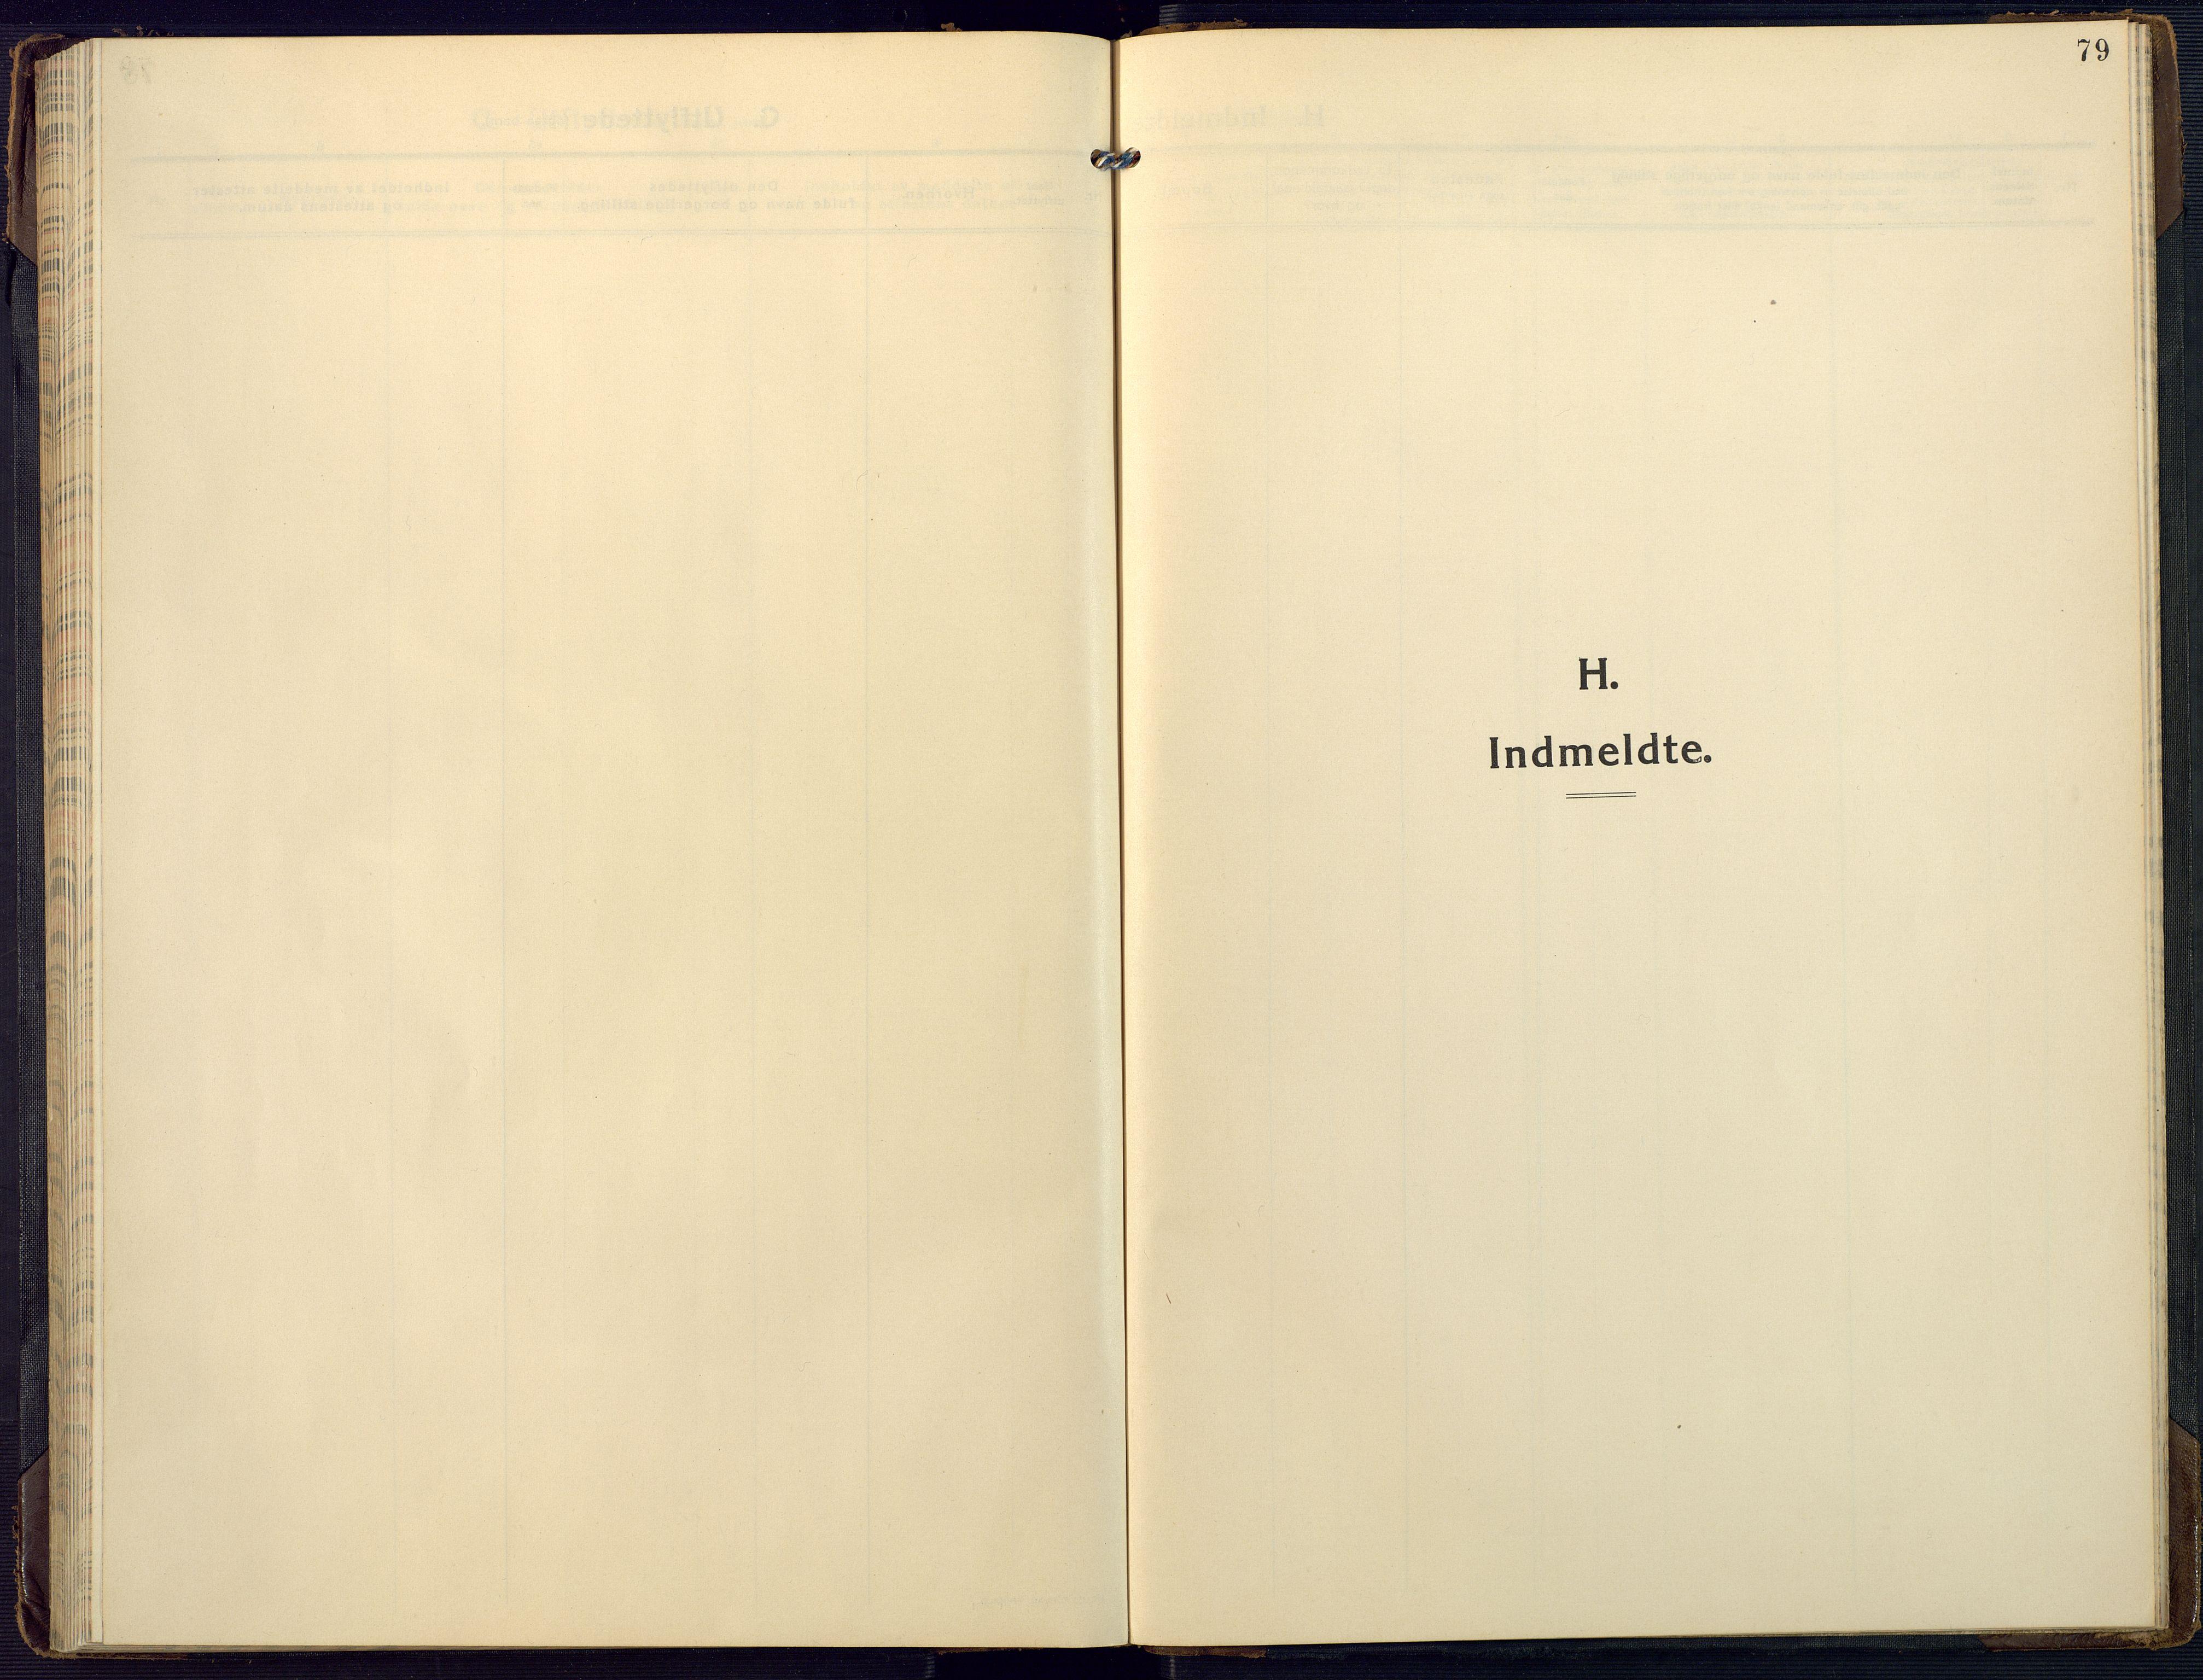 SAK, Mandal sokneprestkontor, F/Fa/Fab/L0003: Ministerialbok nr. A 3, 1913-1933, s. 79